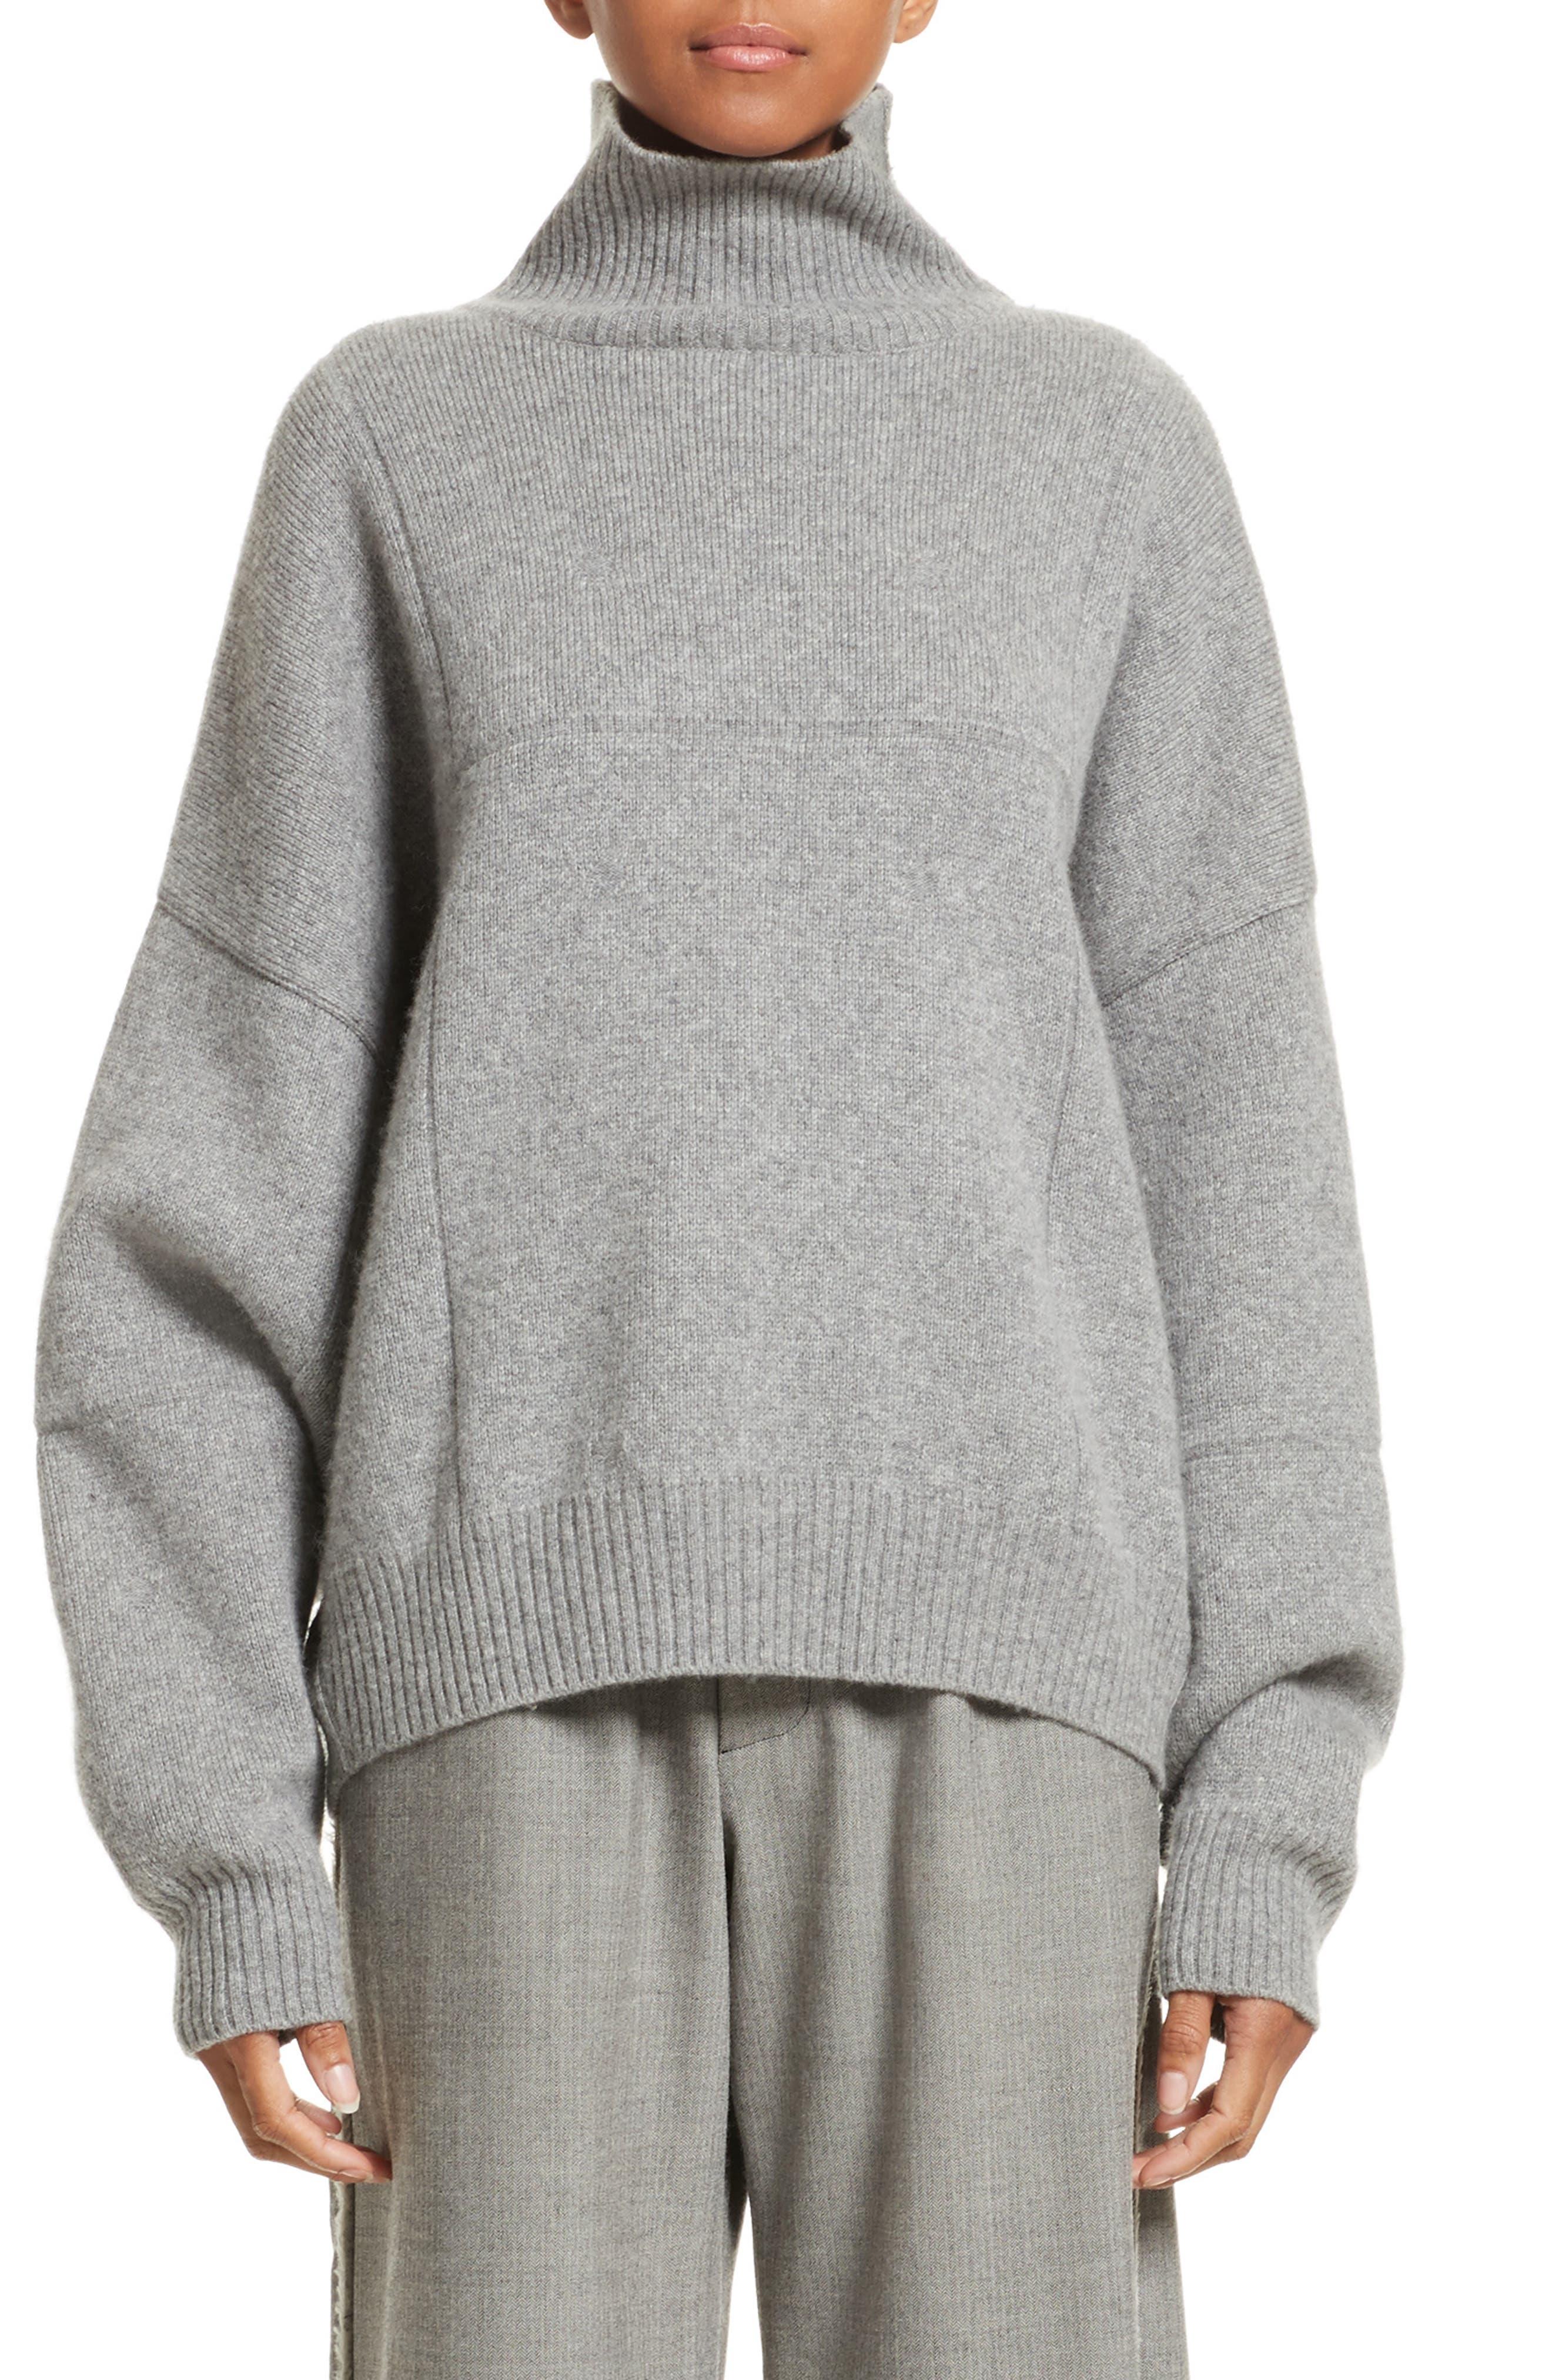 Concrete Wool Turtleneck Sweater,                             Main thumbnail 1, color,                             050